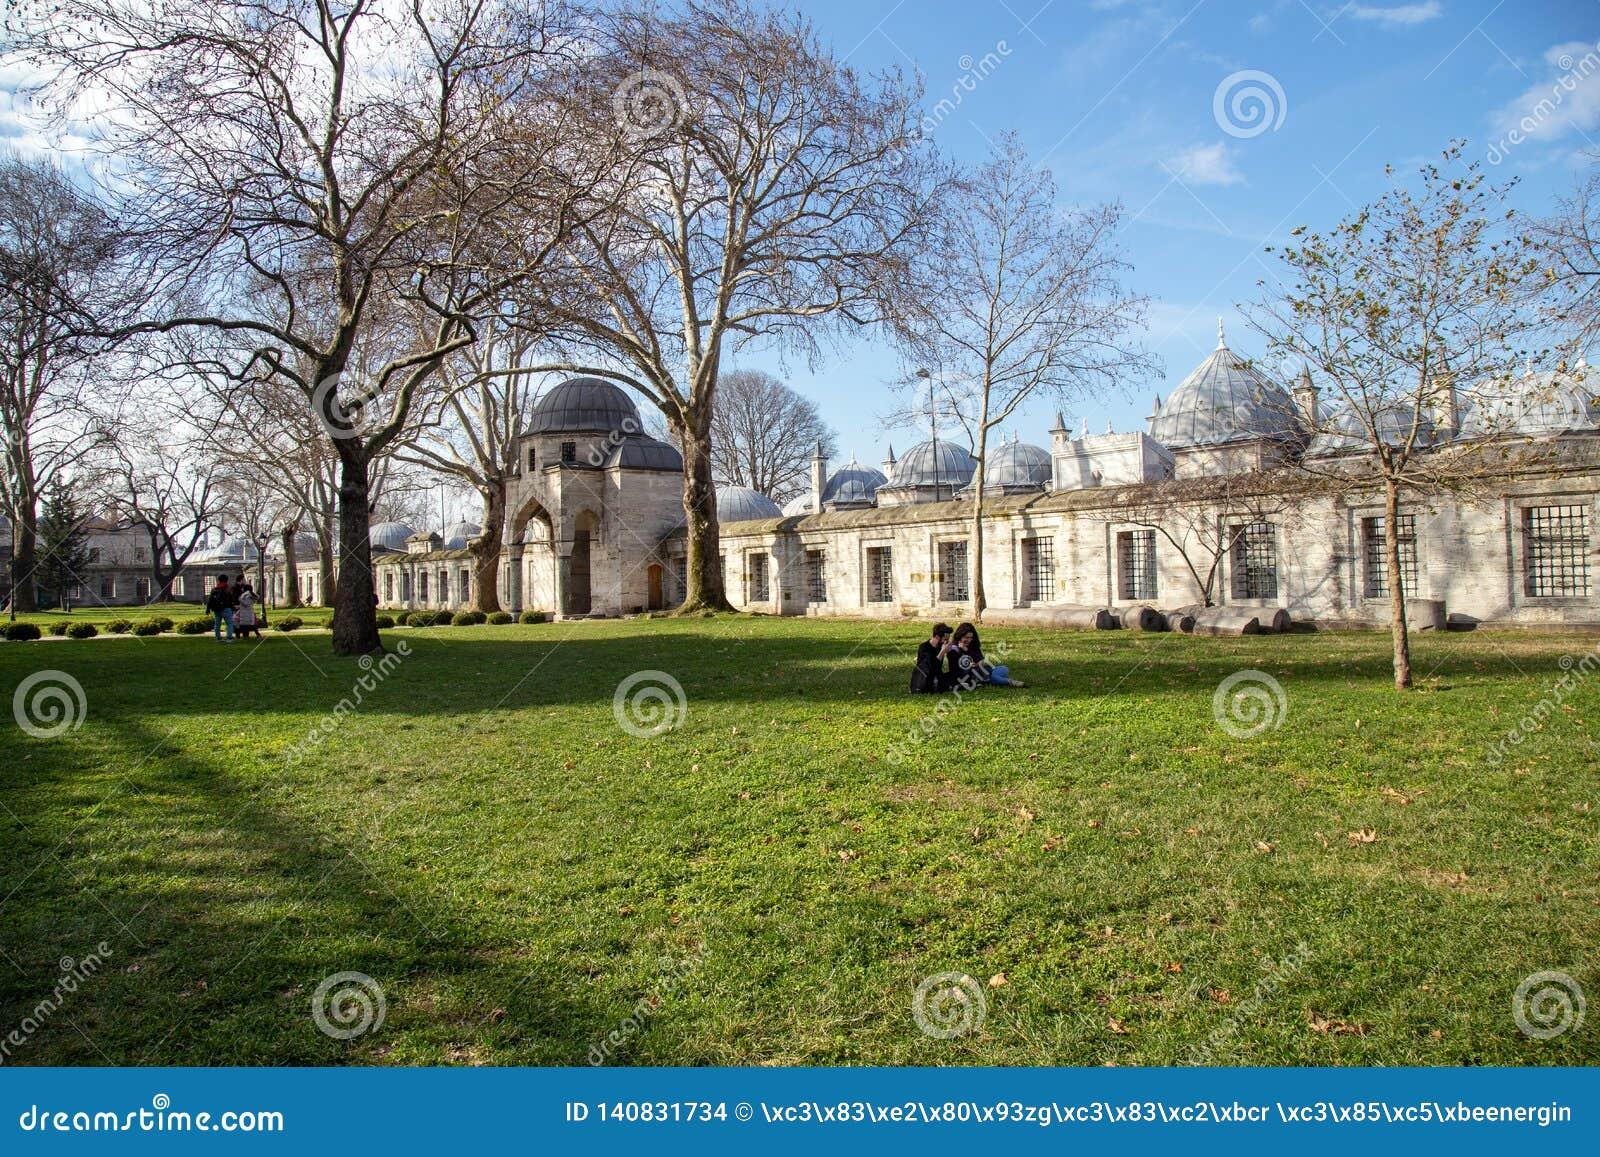 Jardim da mesquita de Suleymaniye _algum turista visitar mesquita estar descansar jardim